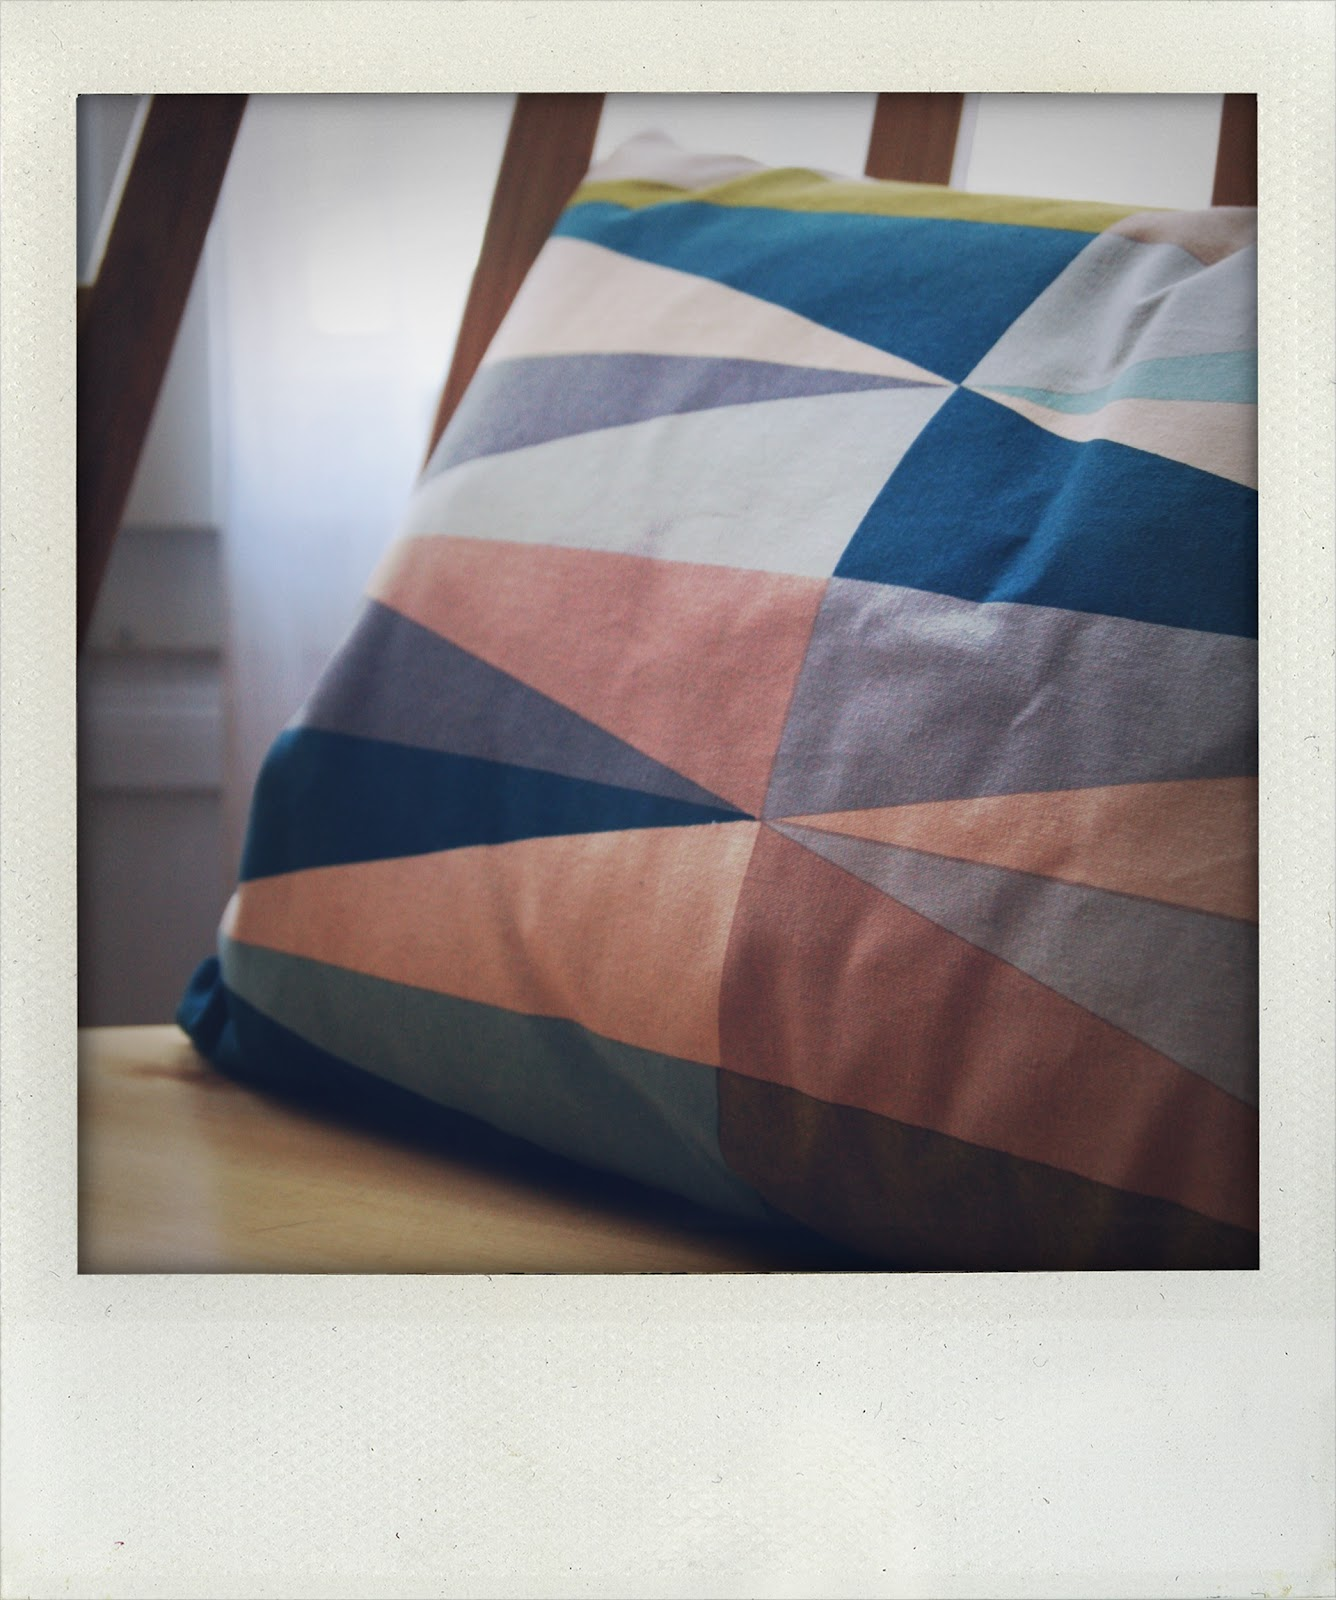 un zeste de clementine blog mode et tendance welcome home. Black Bedroom Furniture Sets. Home Design Ideas